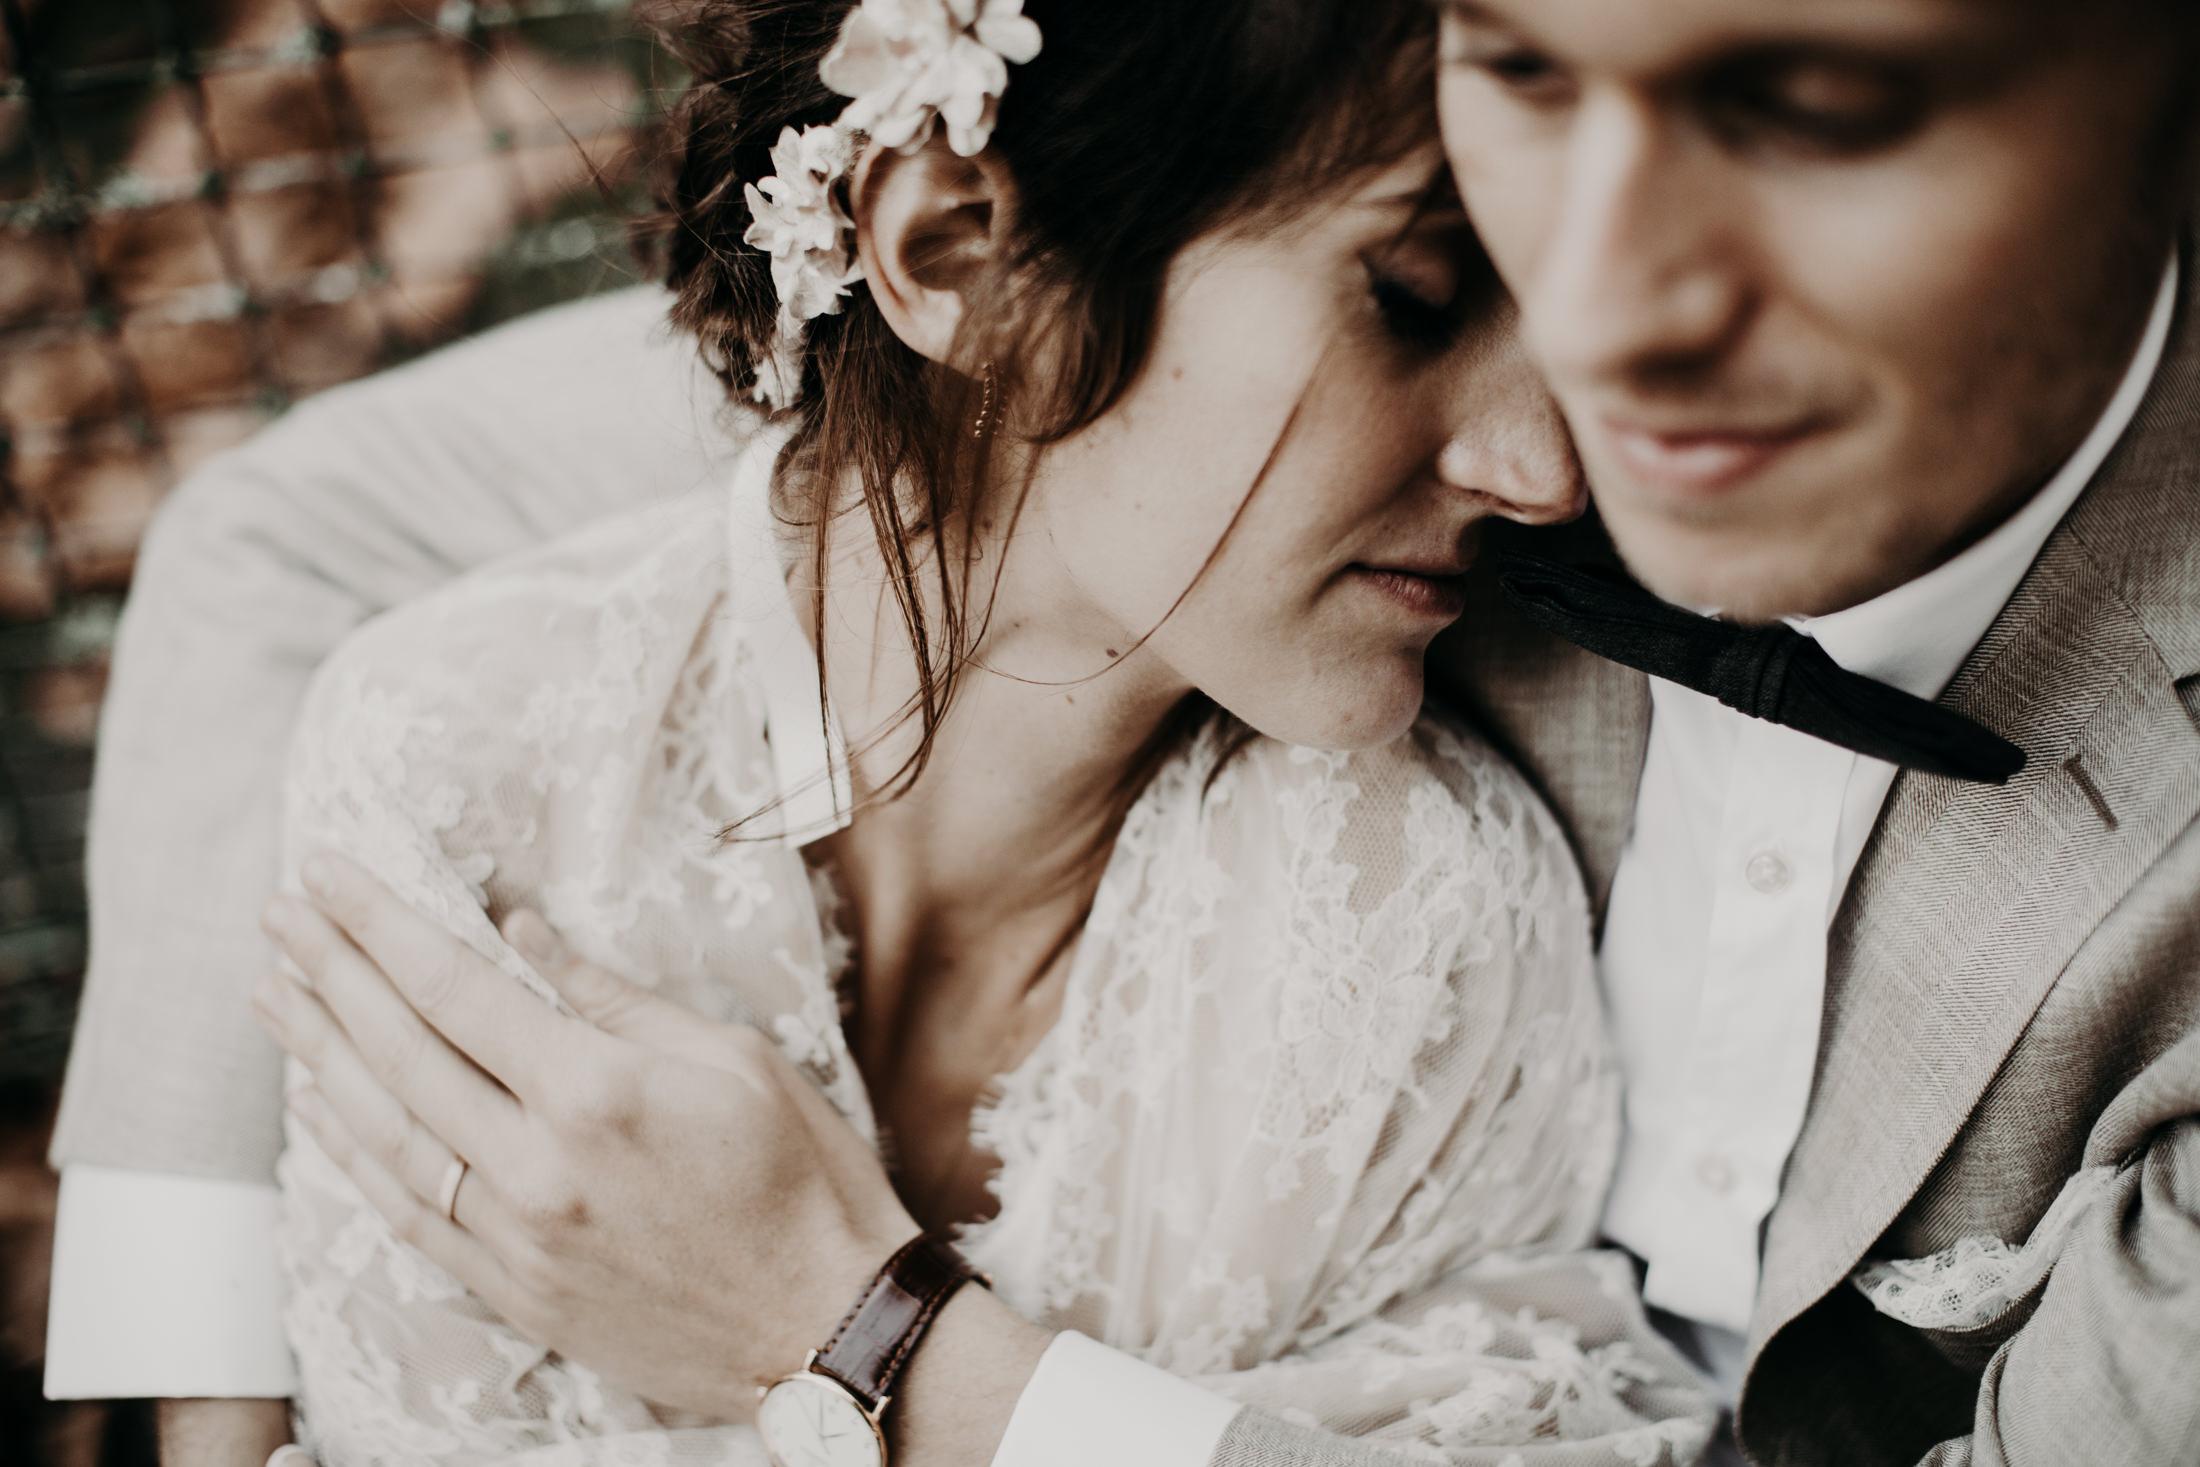 Mariage auvergne photographe wedding_-97.jpg